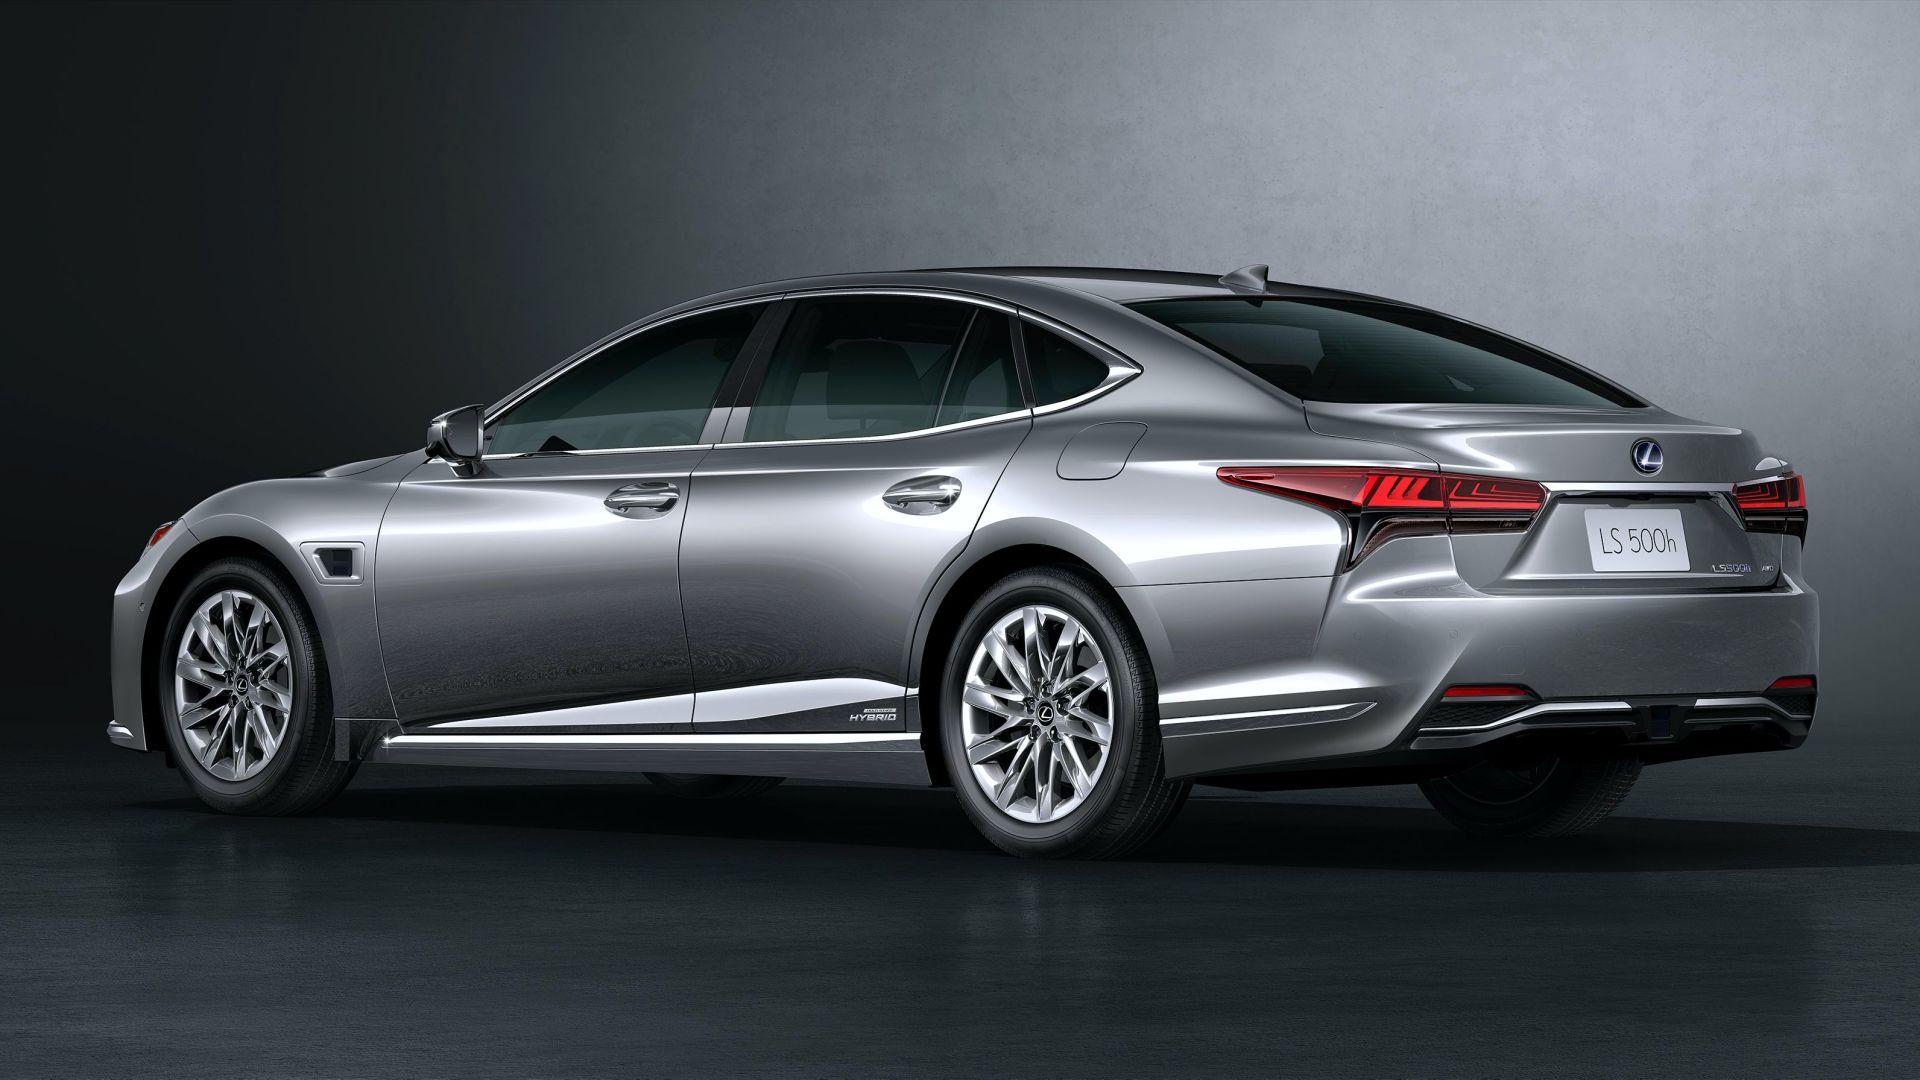 2021-lexus-ls-facelift-8.jpg